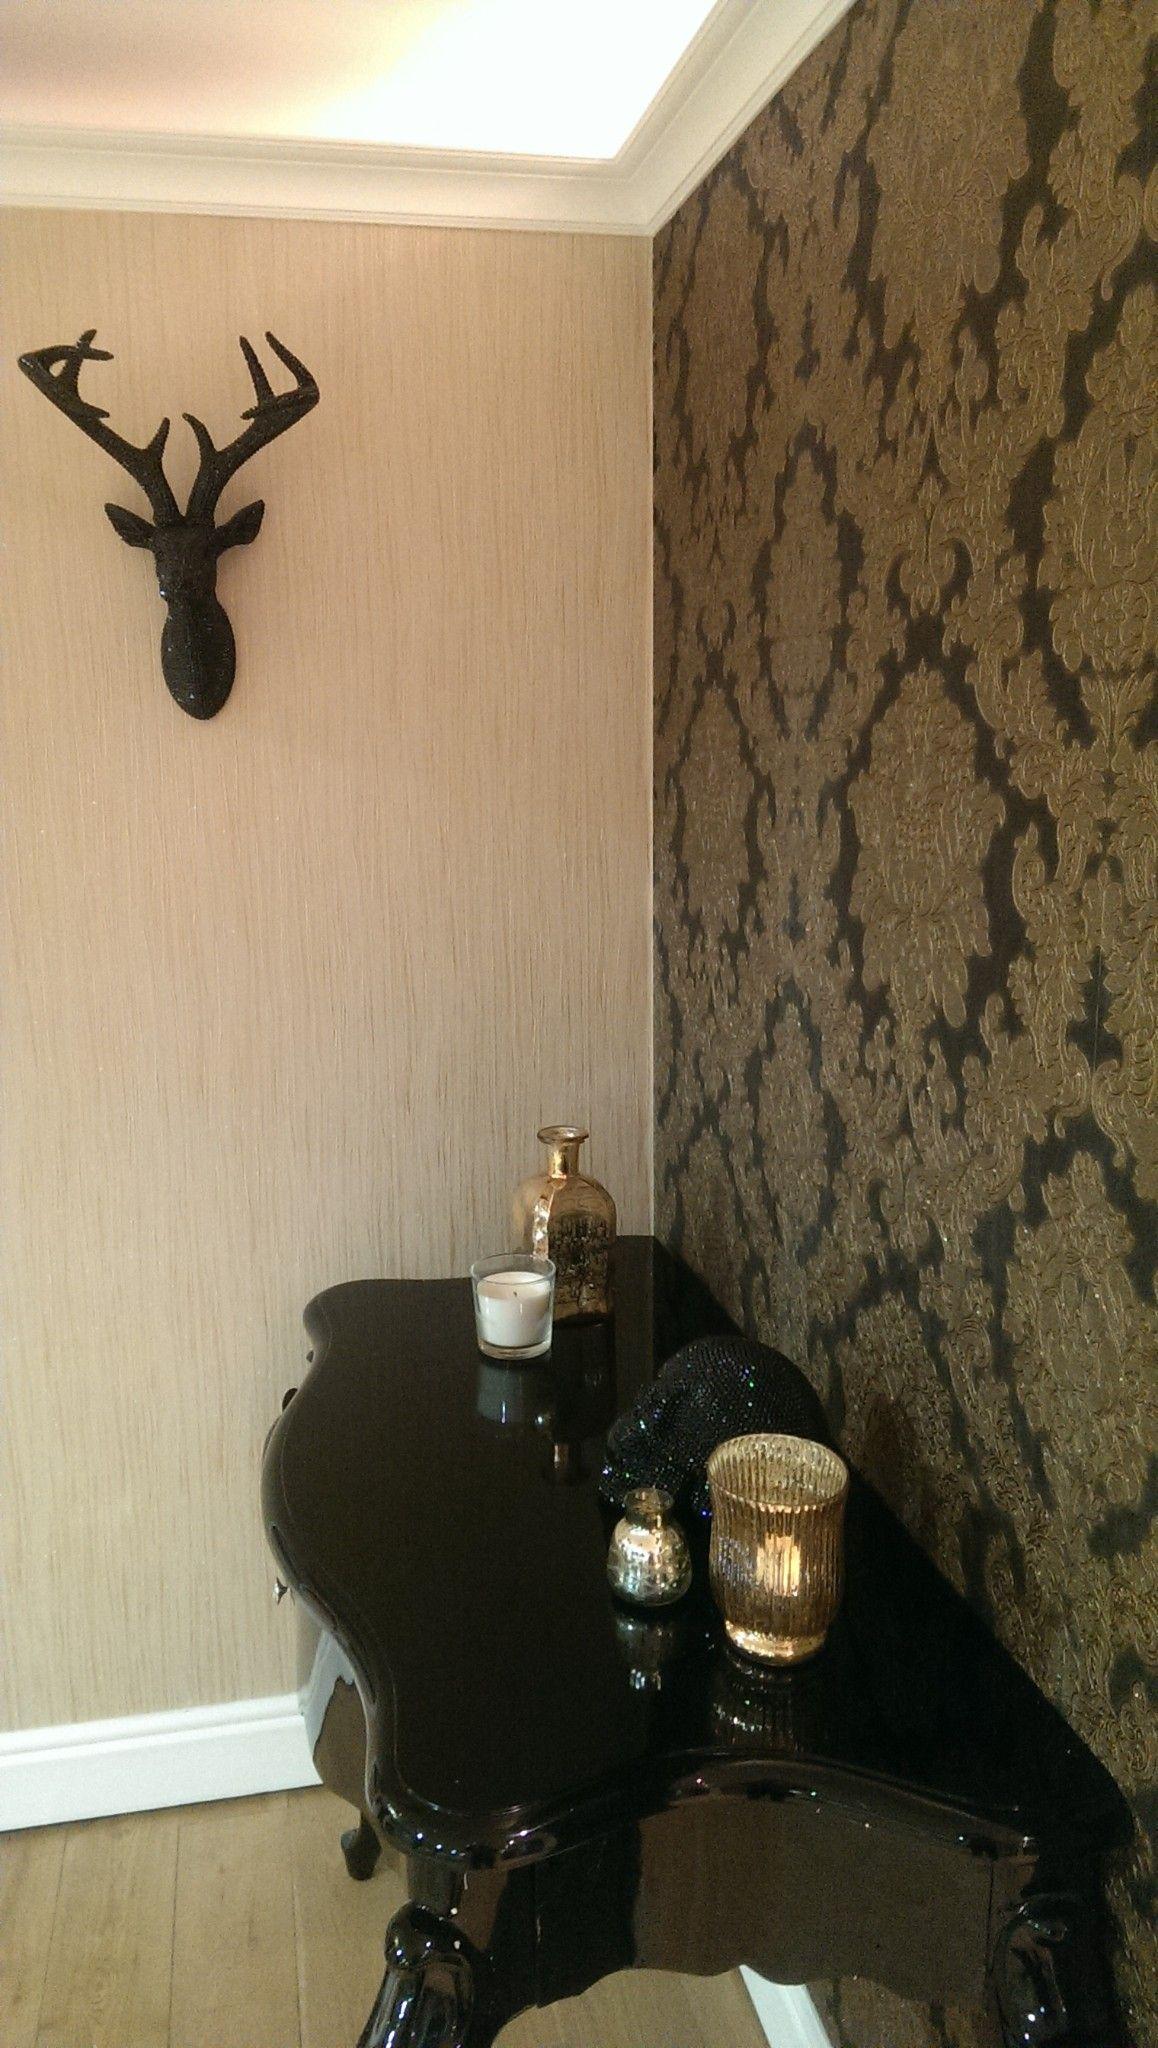 270405 Vicenza Black Gold Glitter Damask Italian Vinyl Vintage Wallpaper Damask Wallpaper Bedroom Damask Wallpaper Wallpaper Bedroom